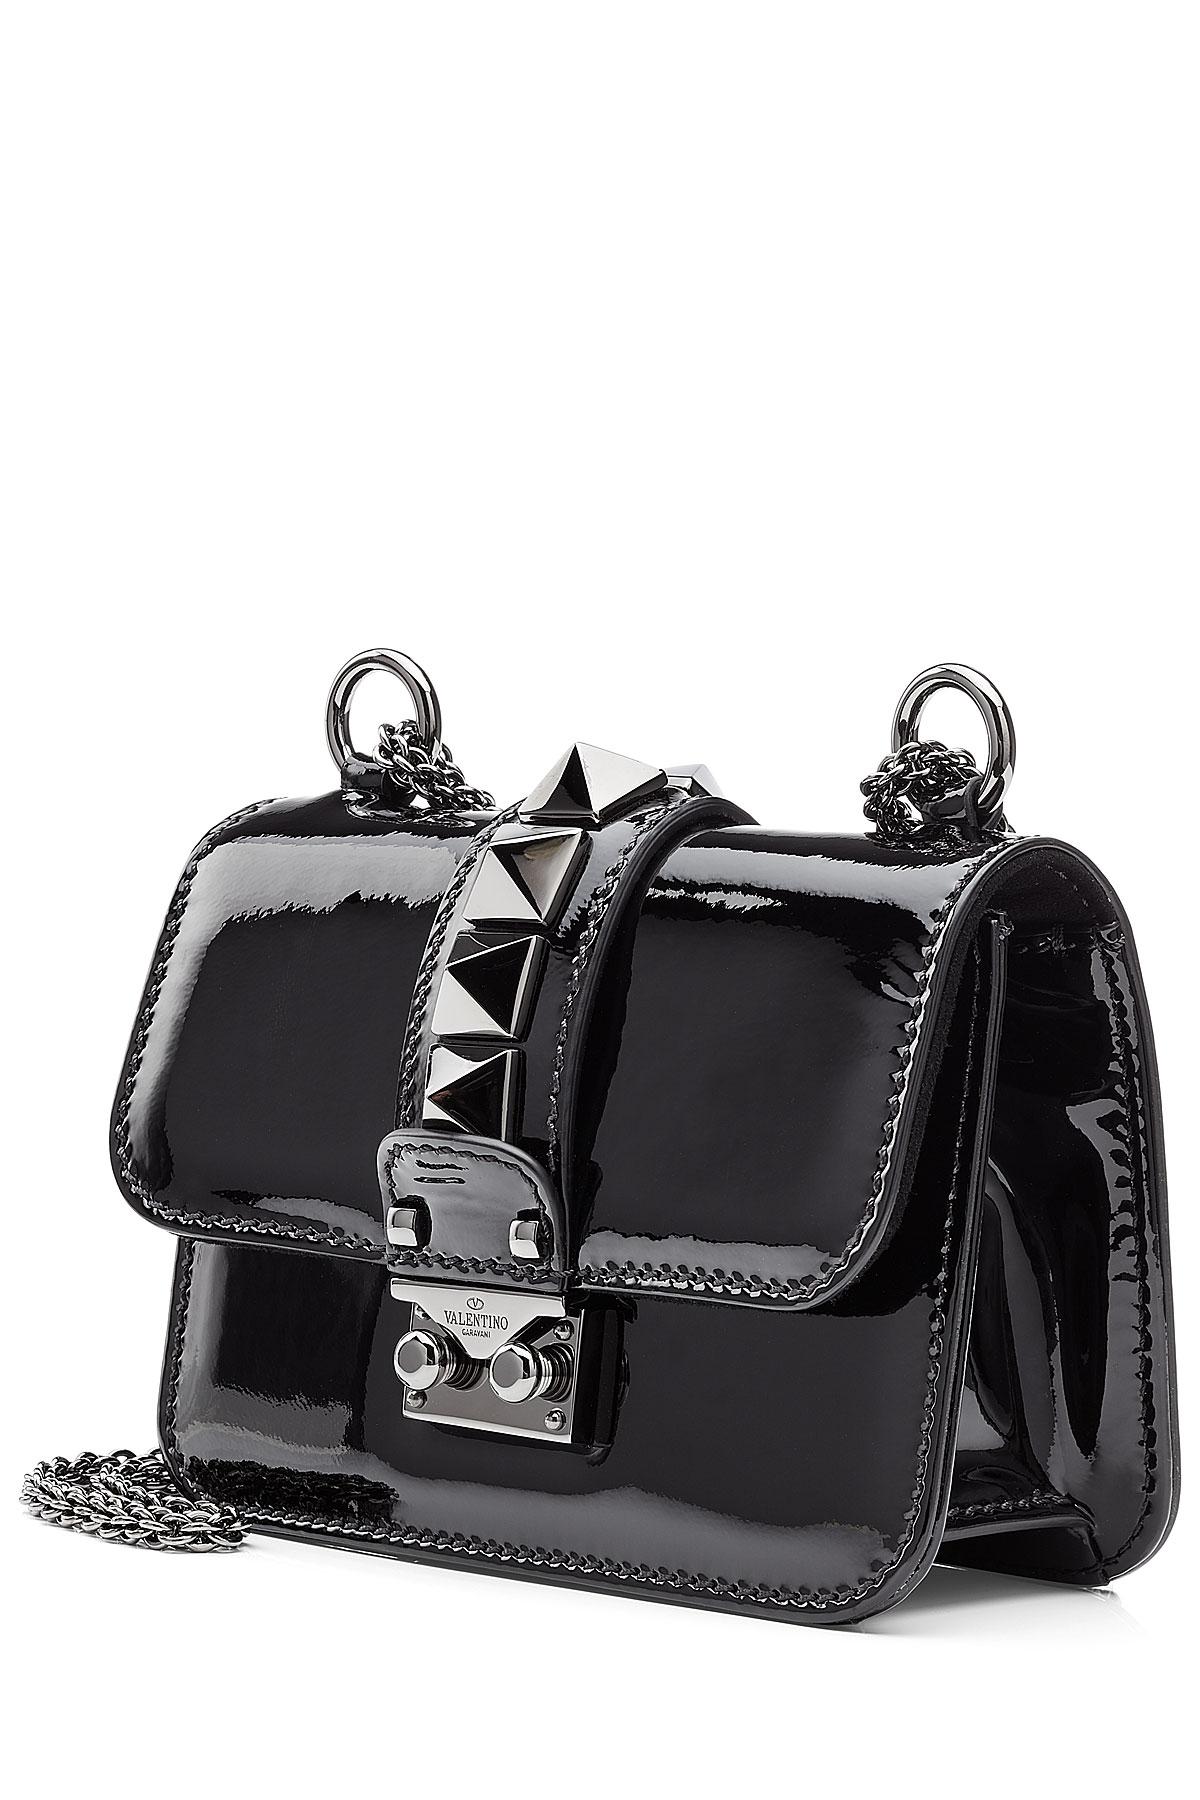 Small Black Patent Shoulder Bag Uk